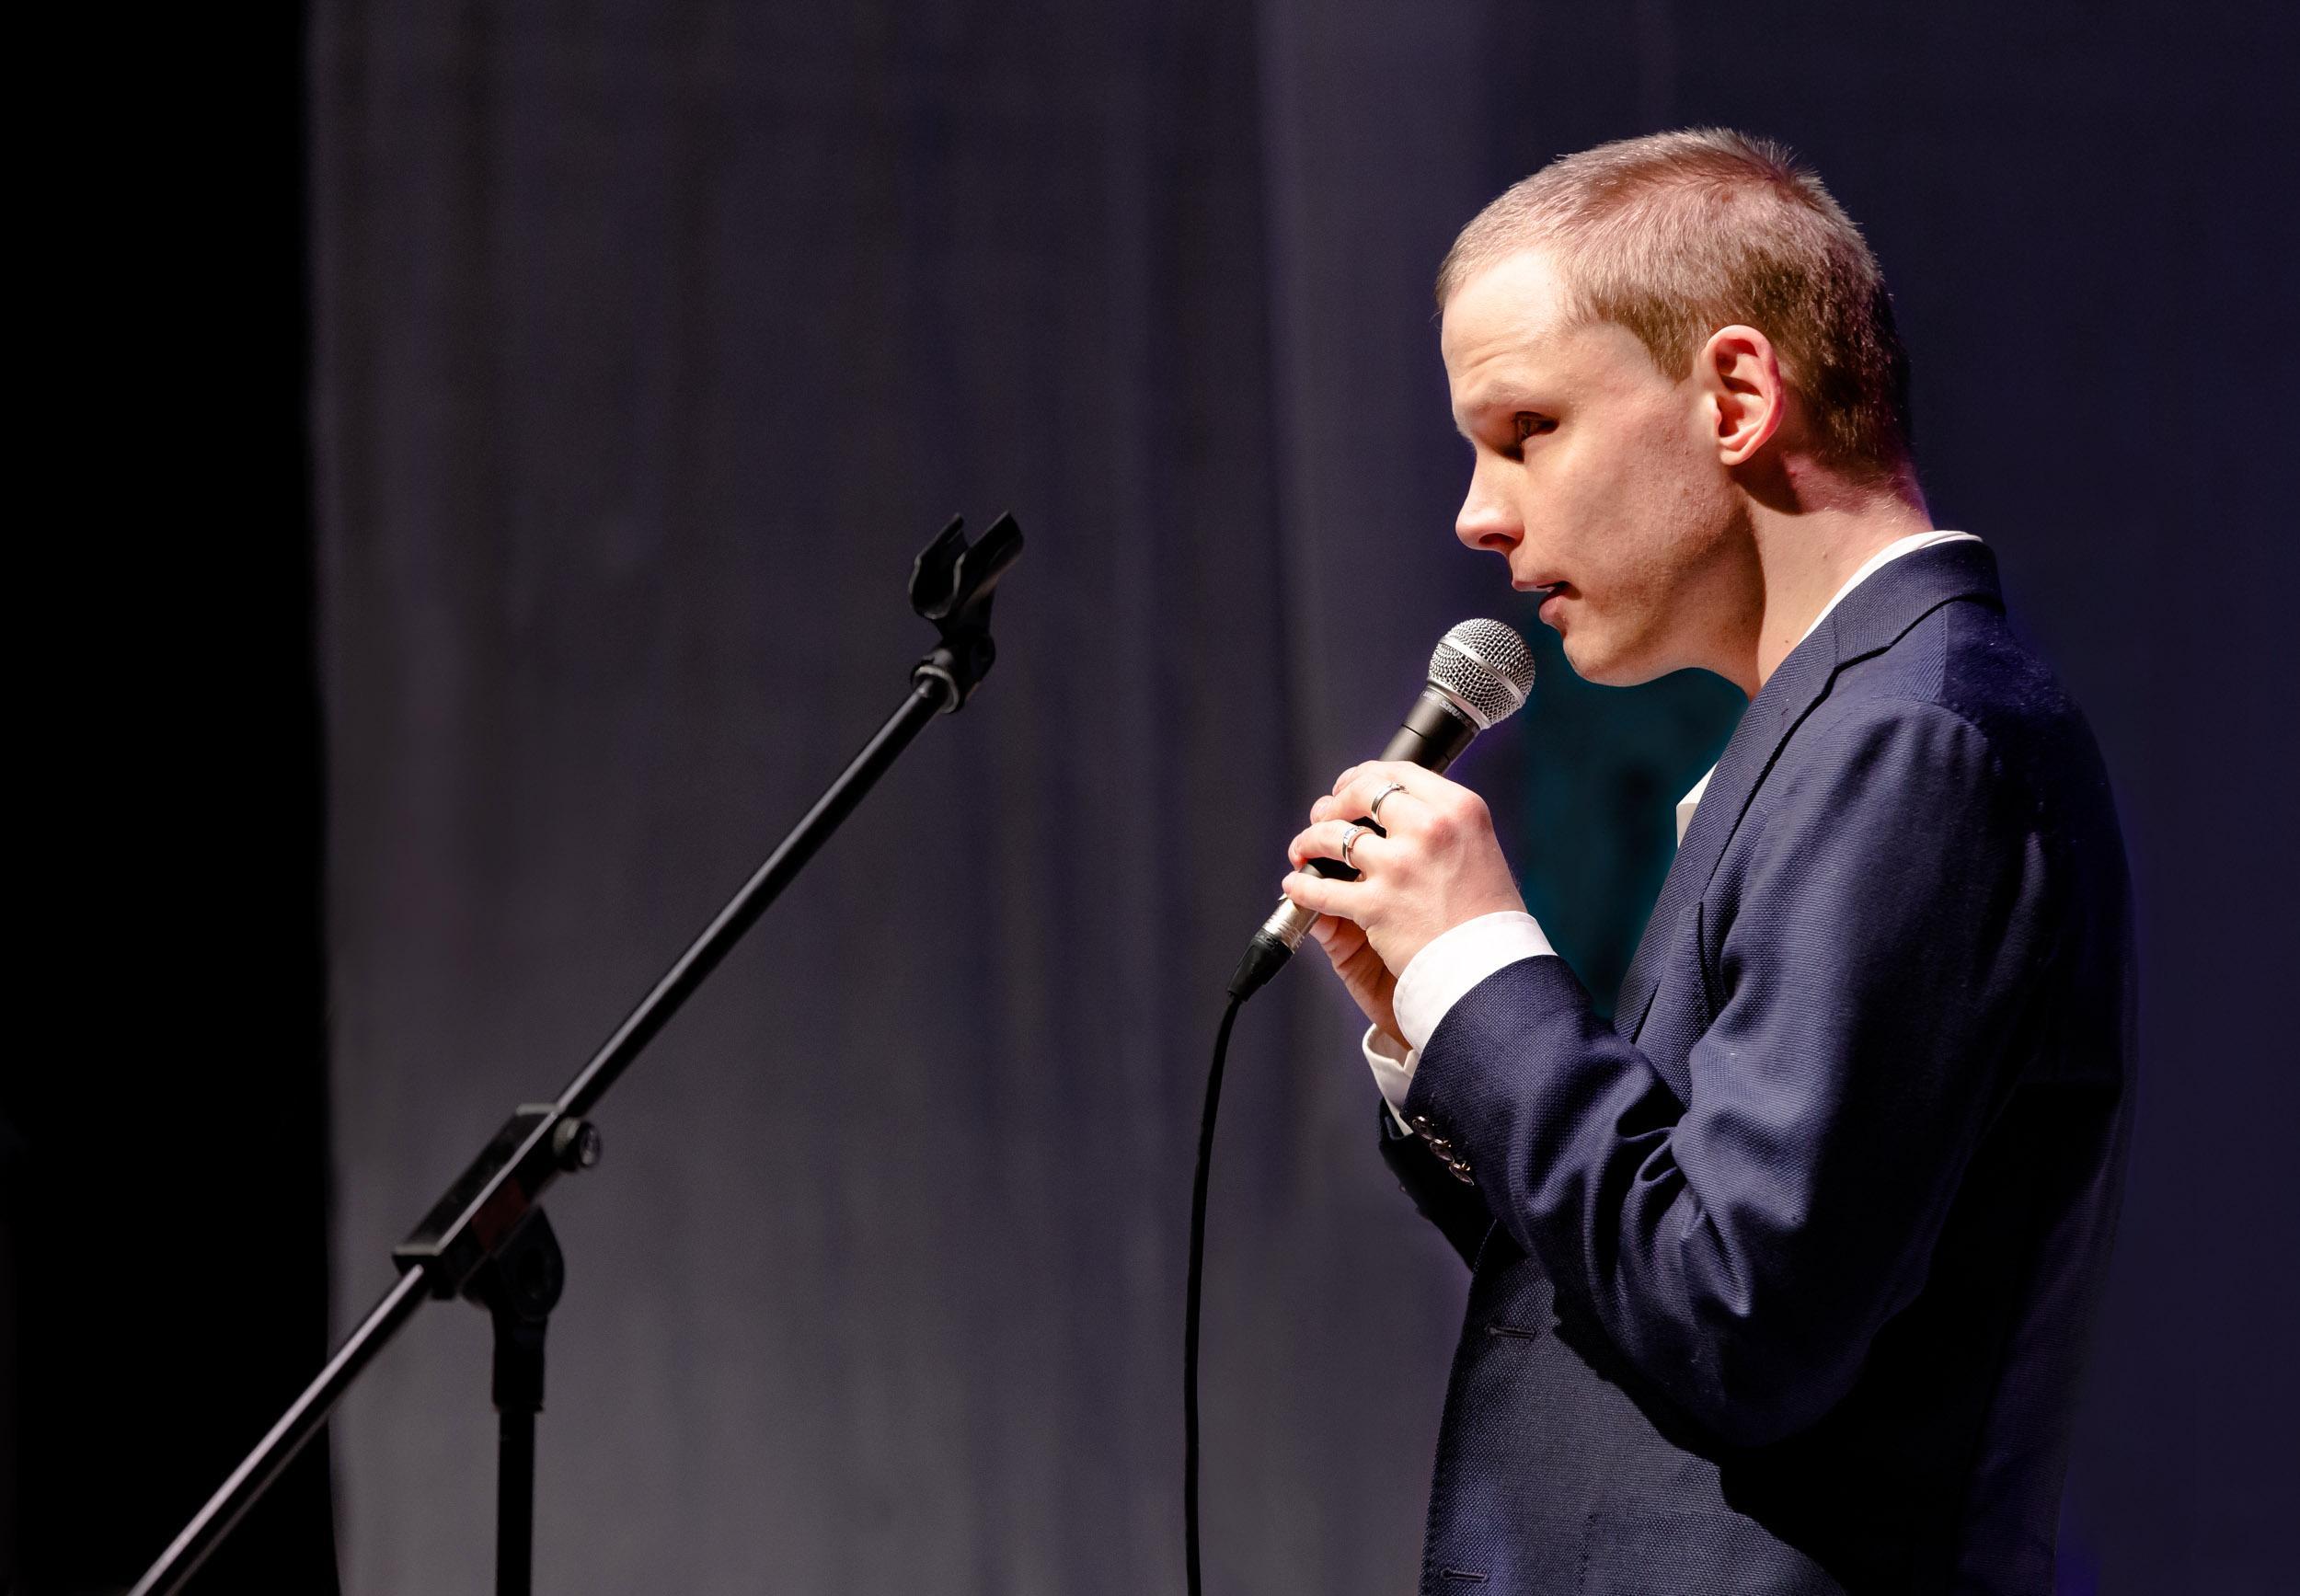 Laulaja Arttu Mäenpää